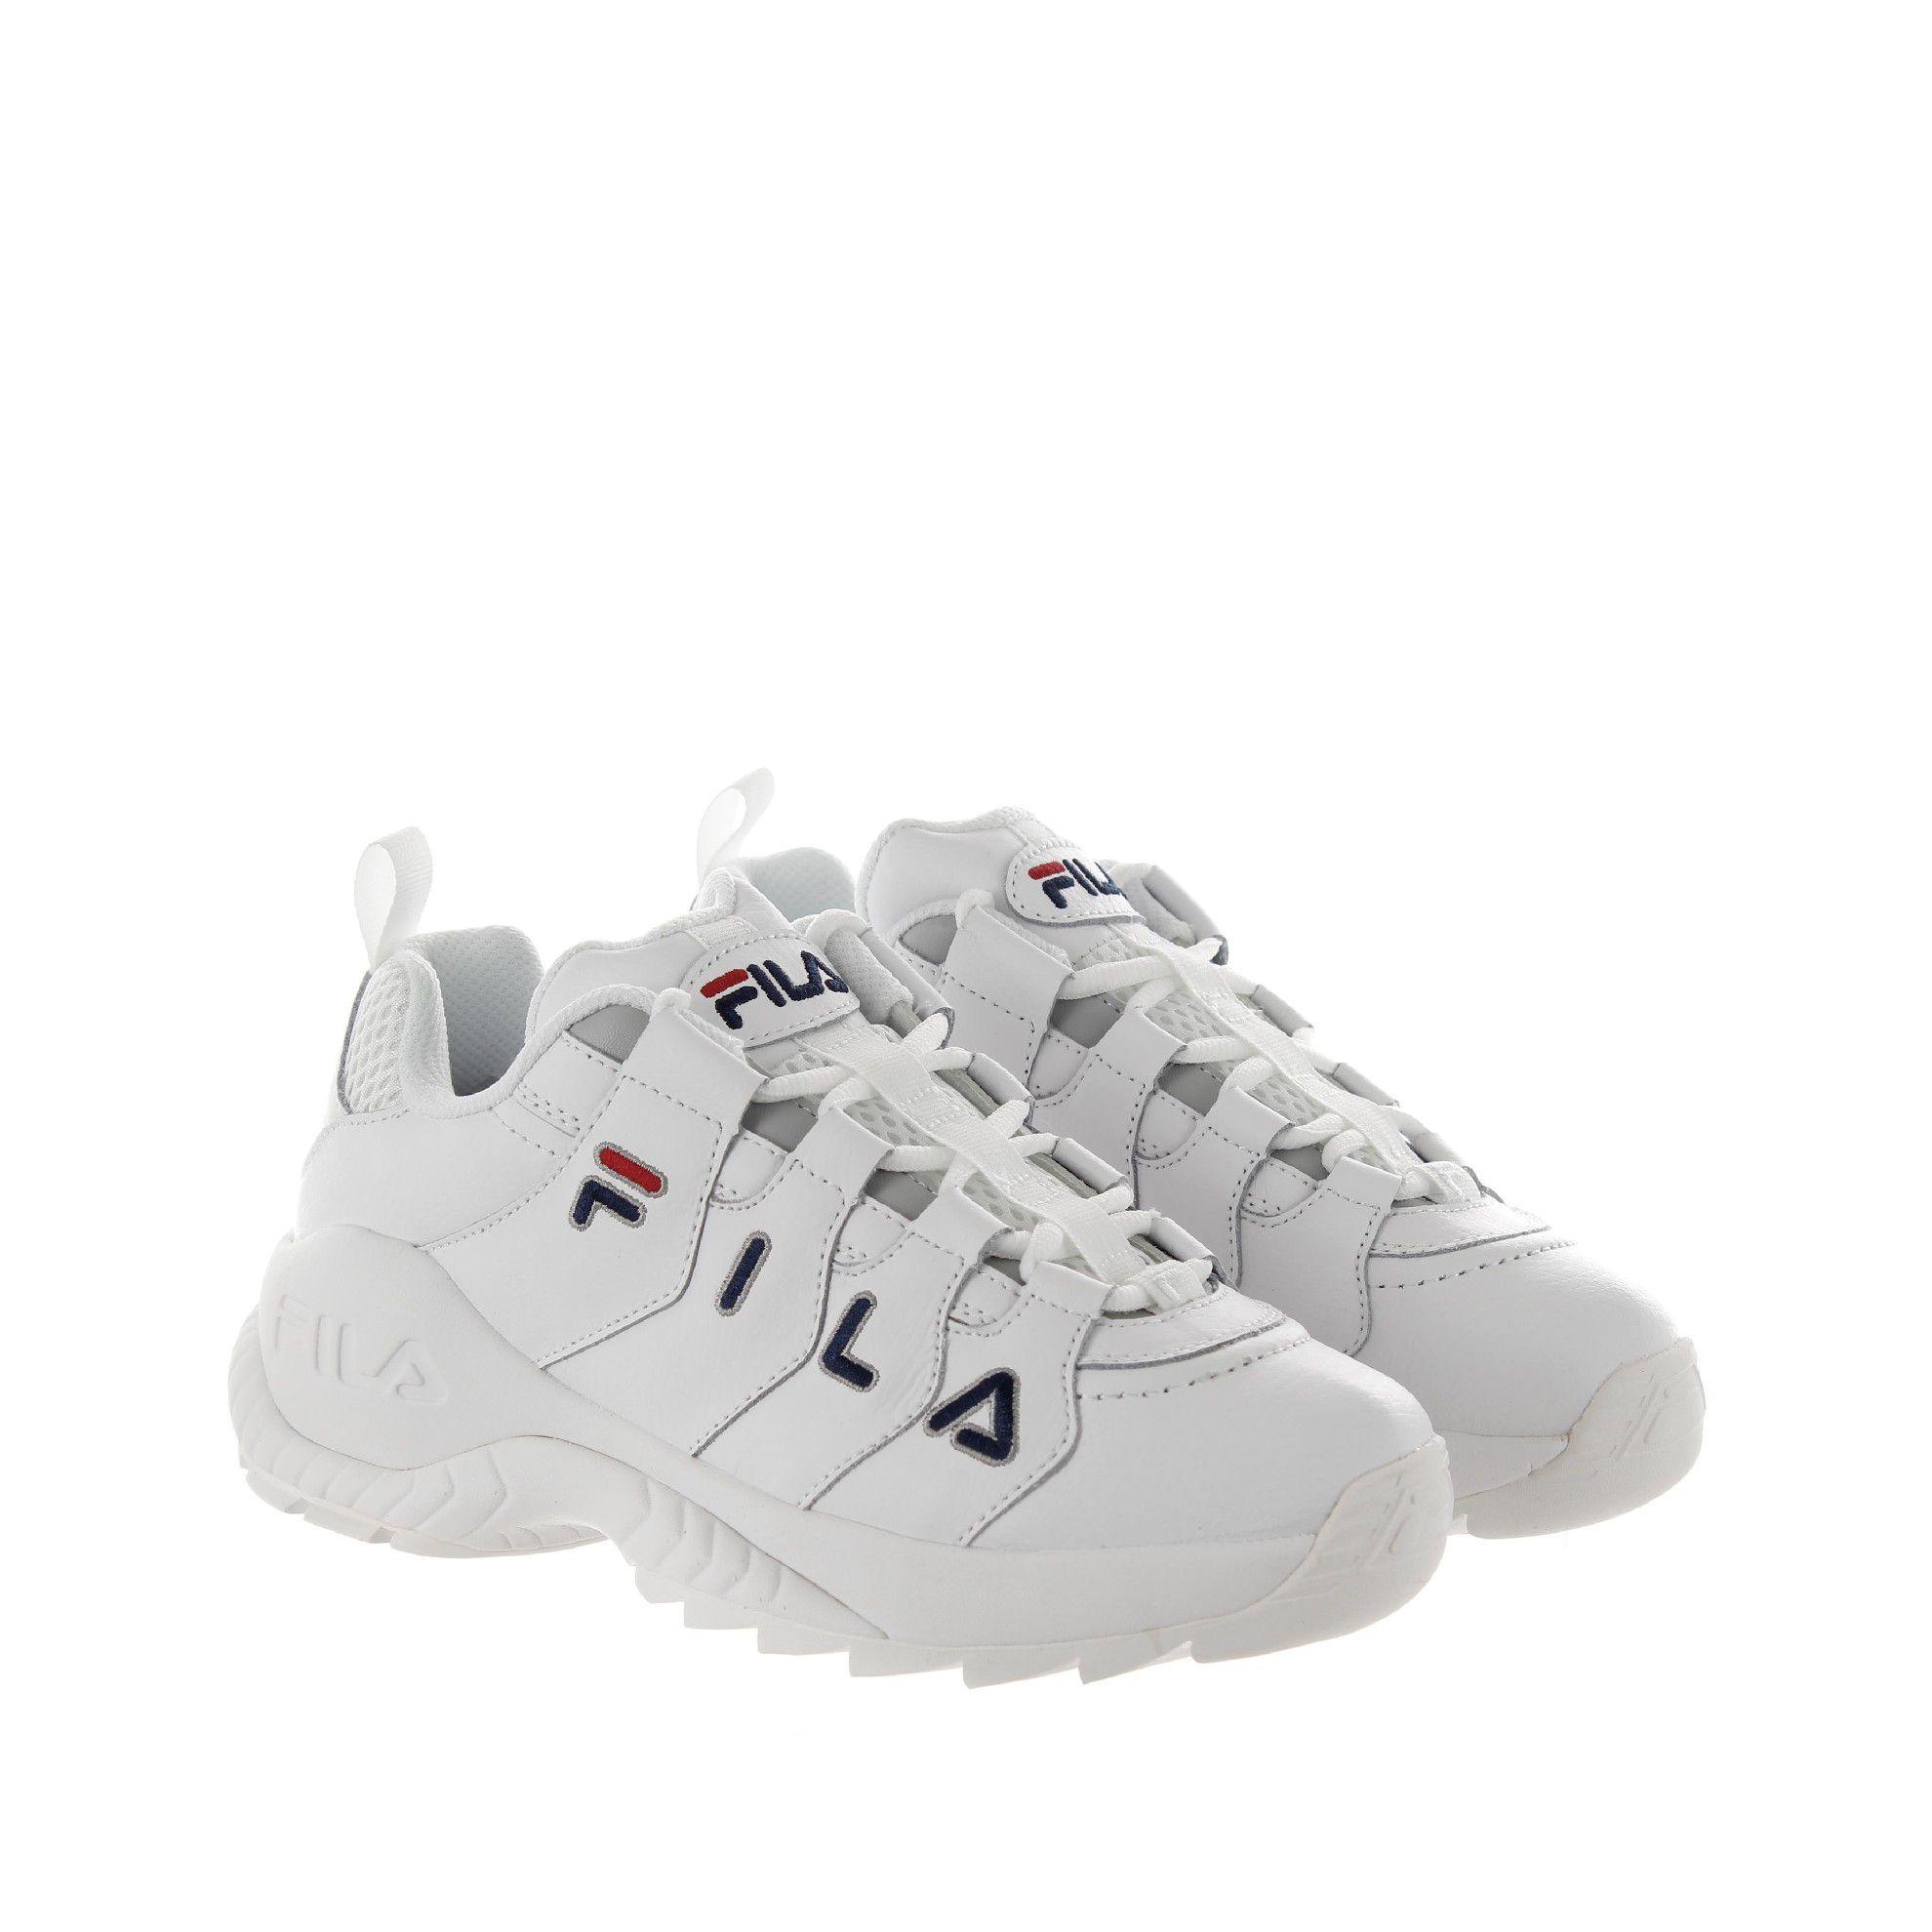 Fila sneaker countdown low in pelle da donna